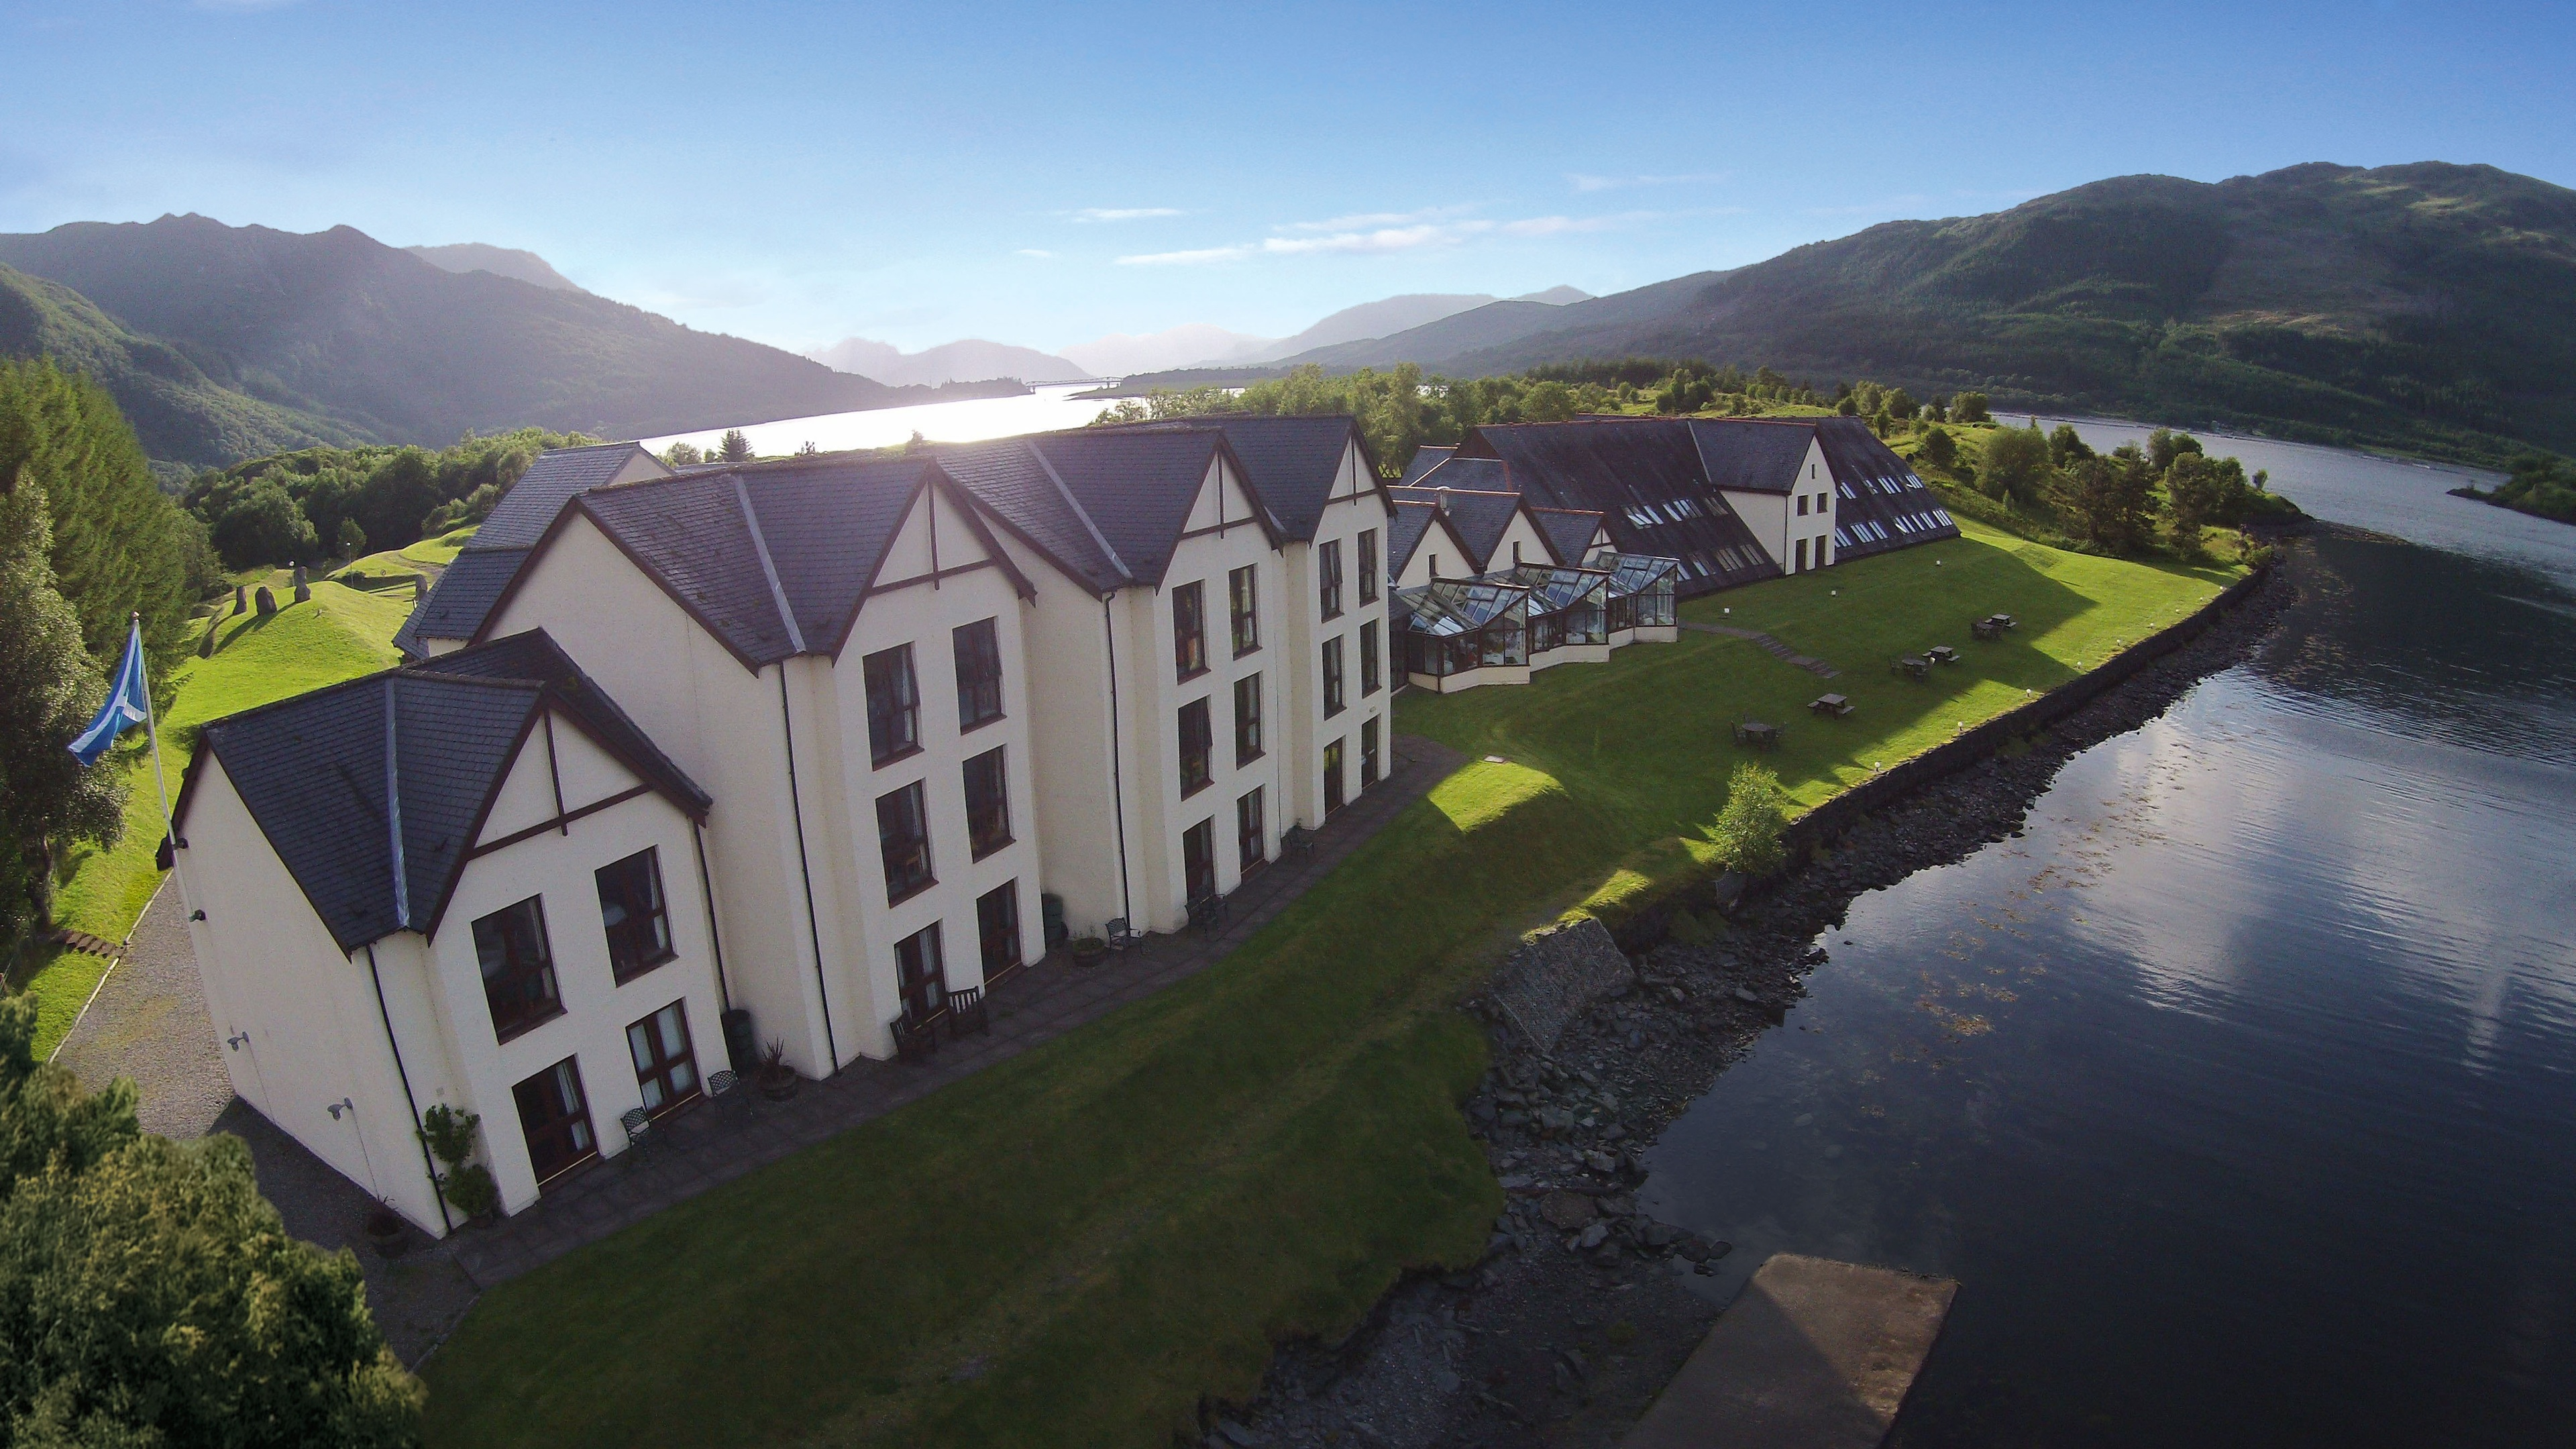 Crieff Hydro has bought the Isles of Glencoe Hotel.